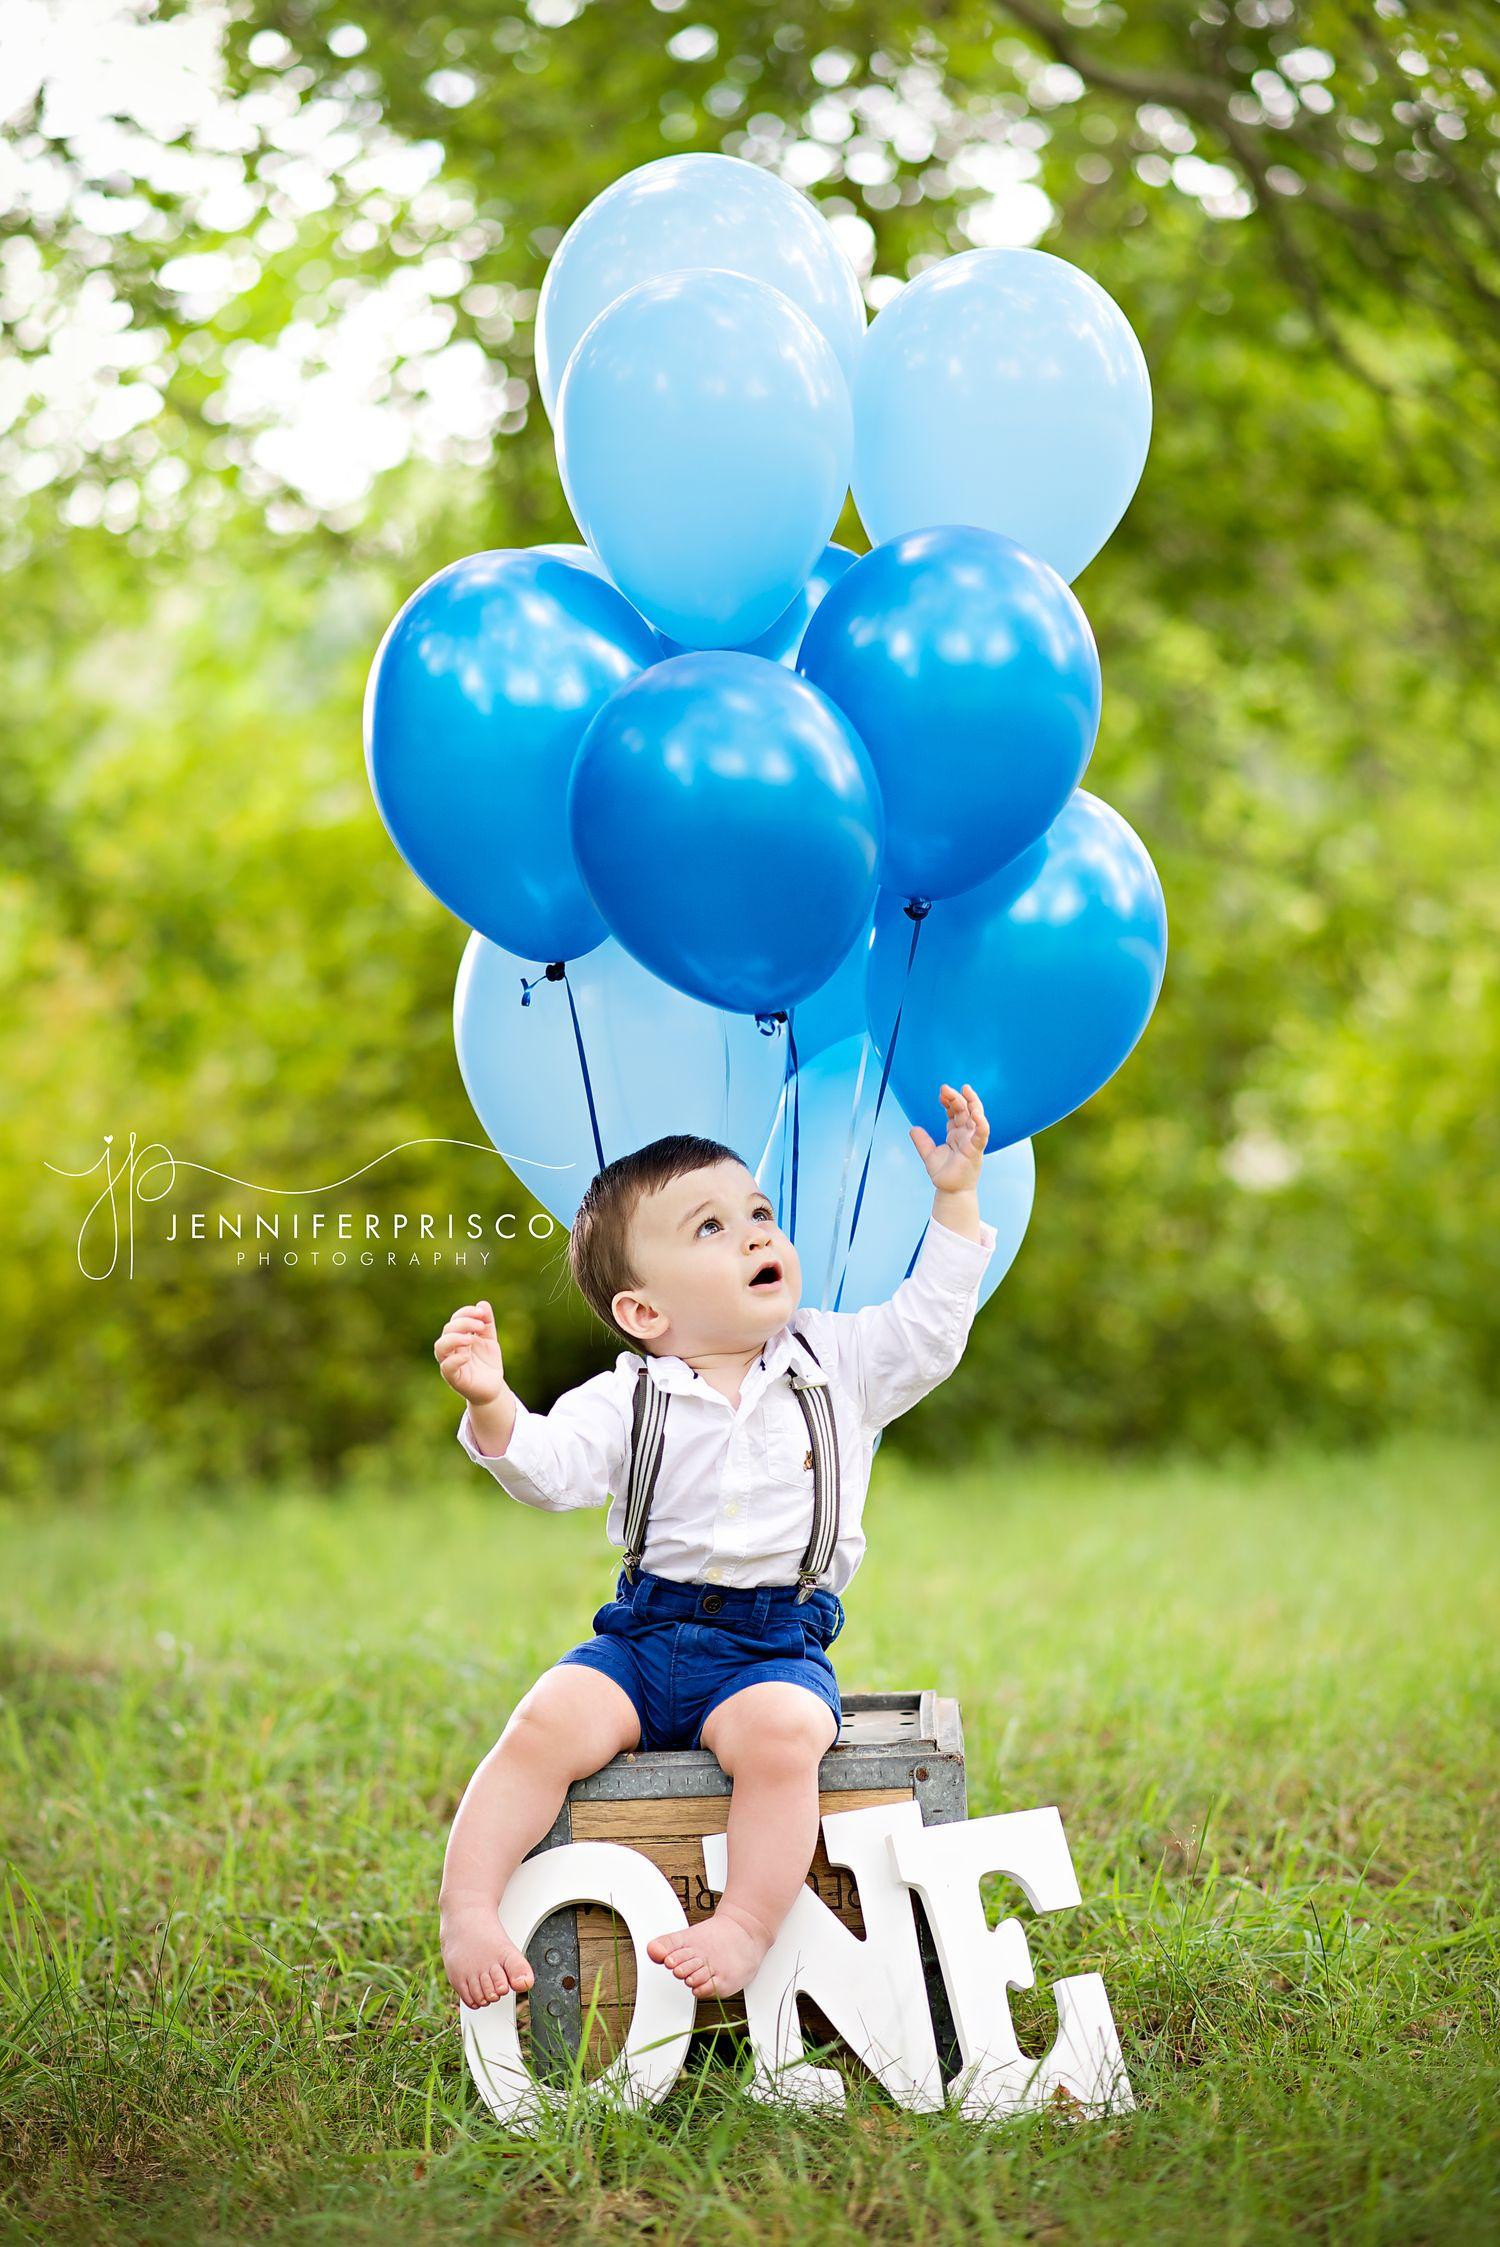 Pin By Ensly Güílamo On One Baby Boy Pinterest Birthday Photos